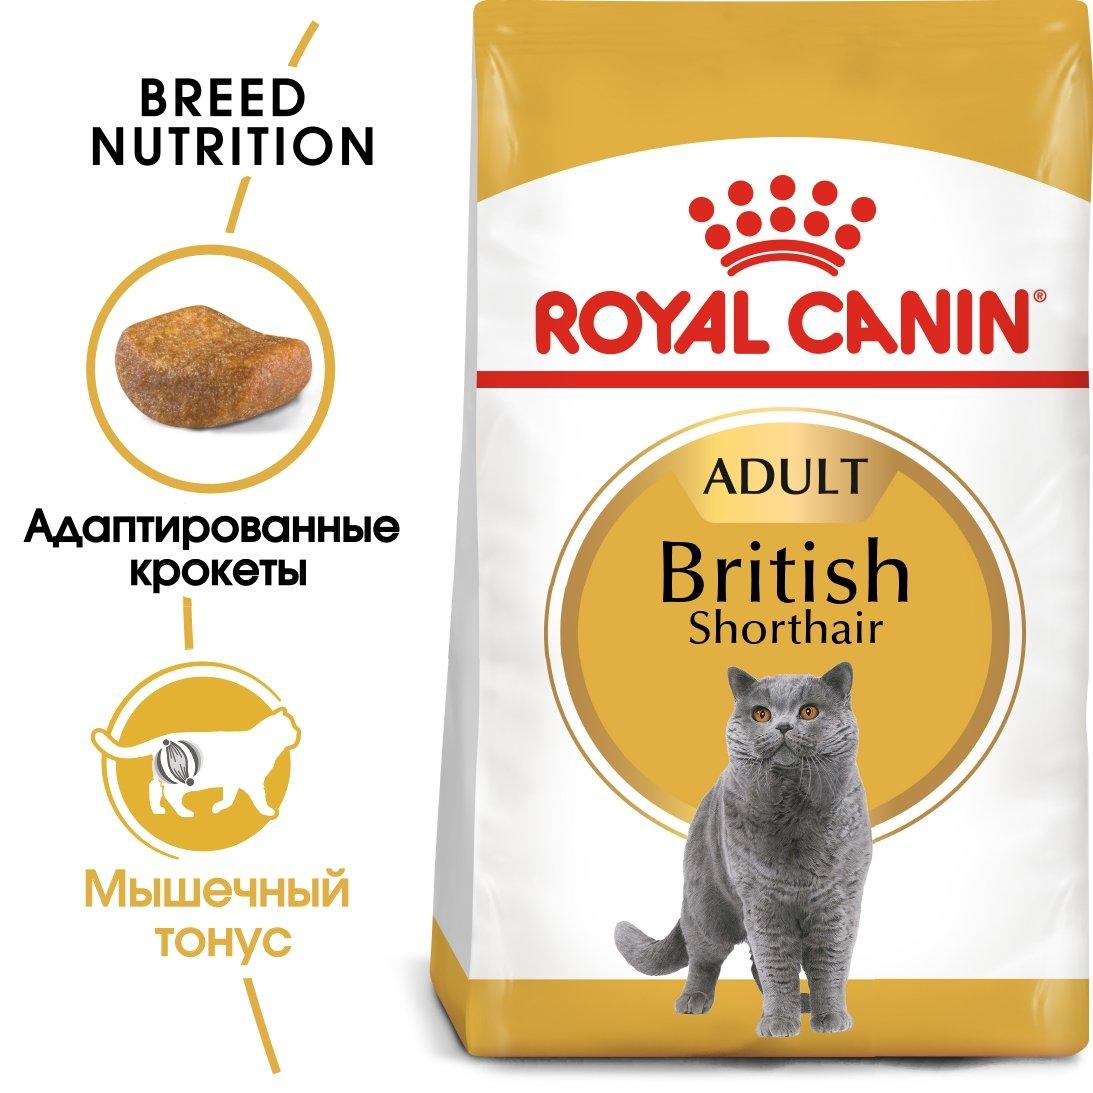 Royal Canin Adult British Shorthair сухой корм для взрослых кошек породы Британская короткошерстная